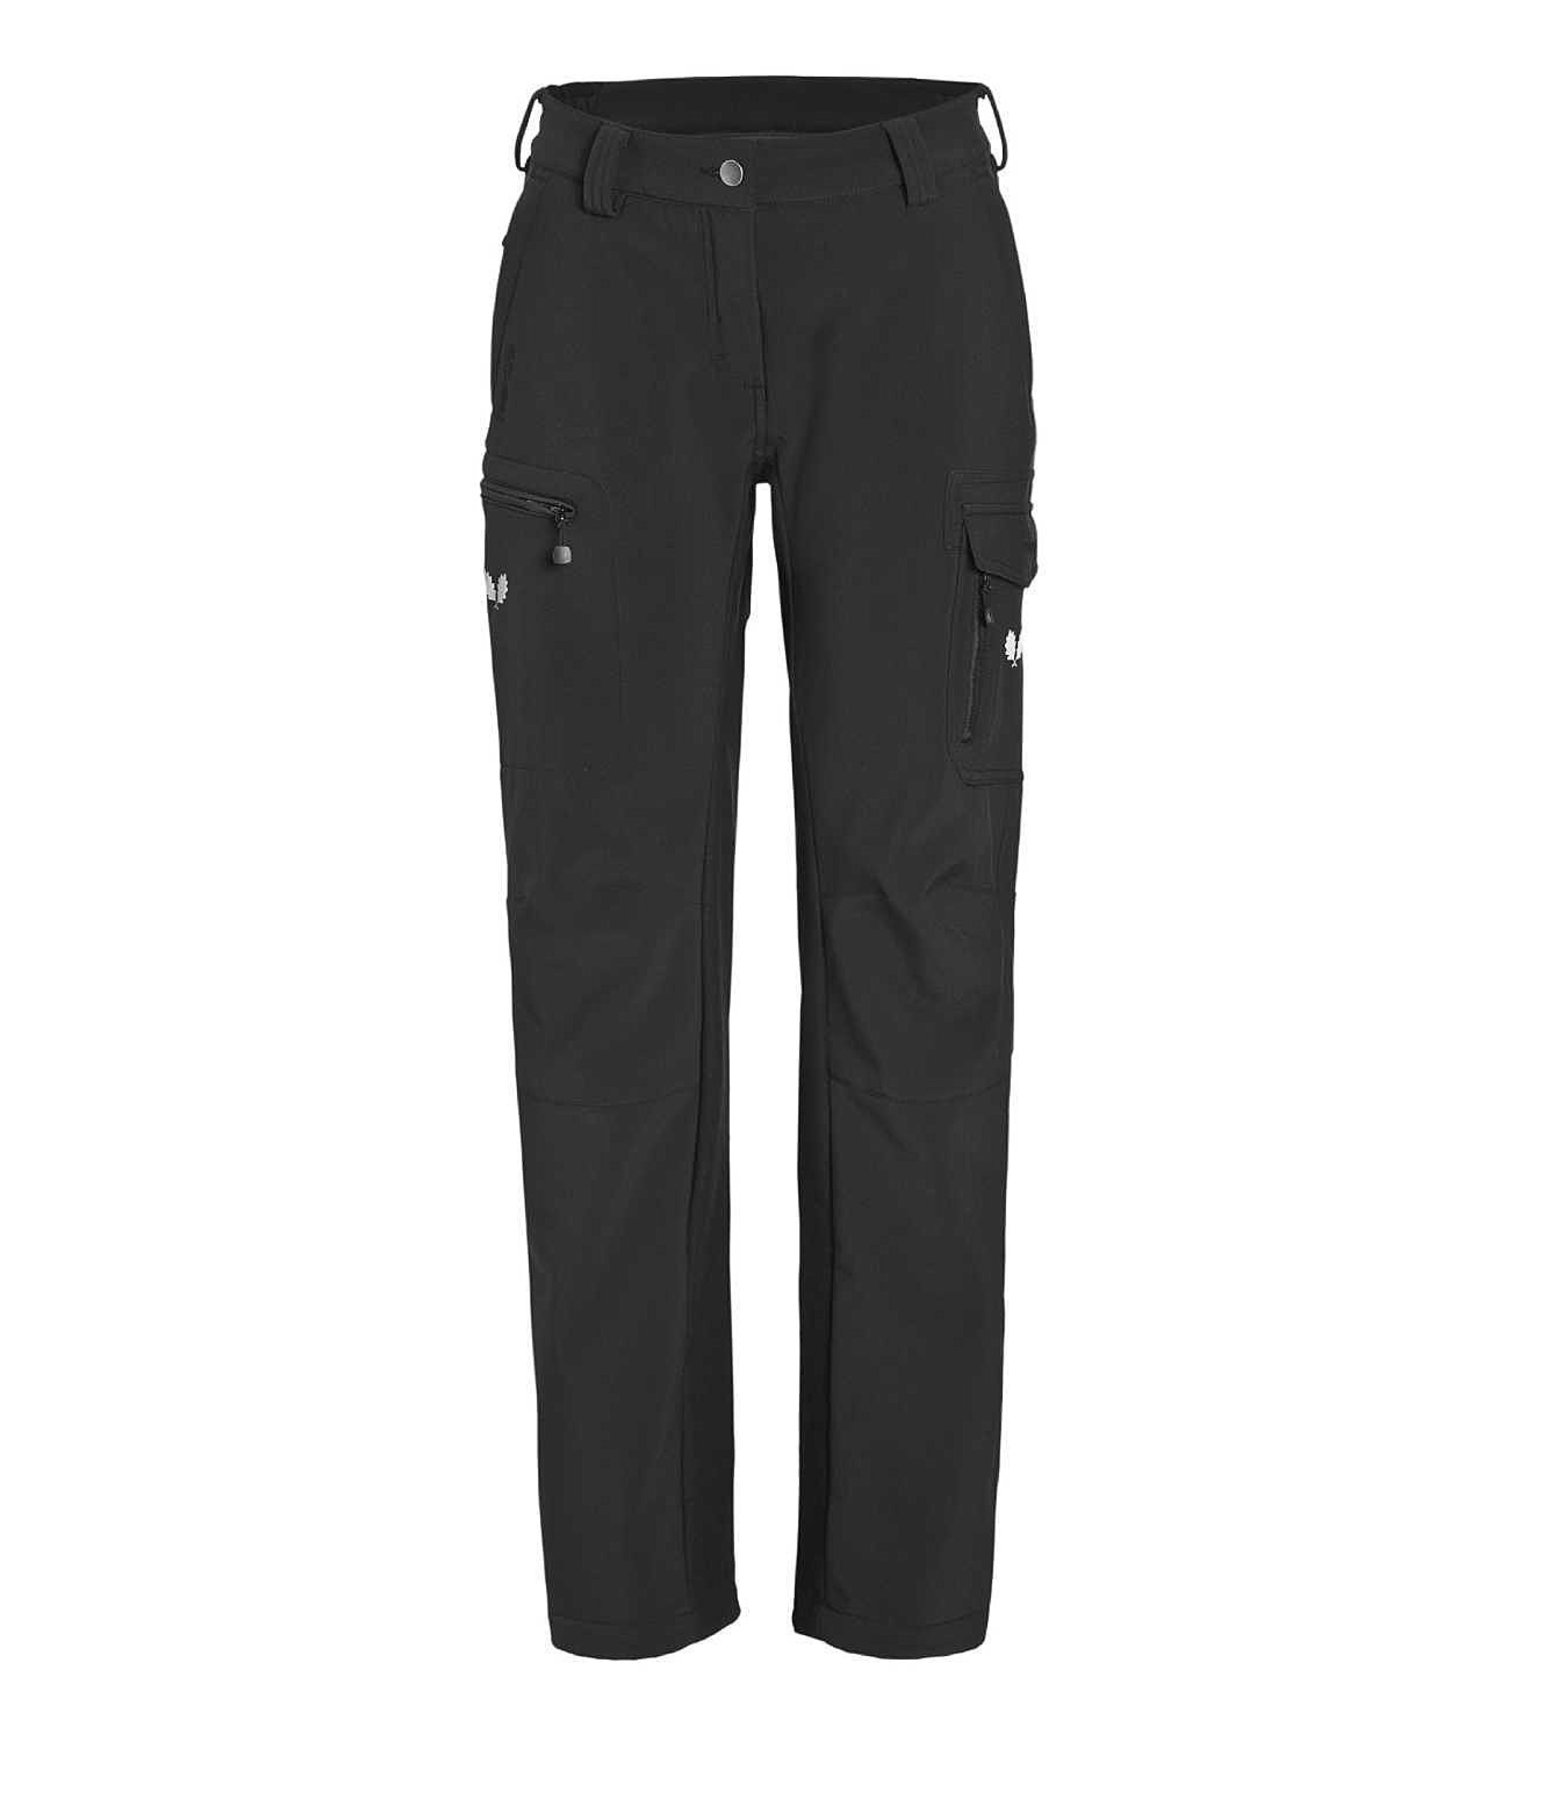 pantalon de randonn e maple version hiver mode randonn e kramer equitation. Black Bedroom Furniture Sets. Home Design Ideas